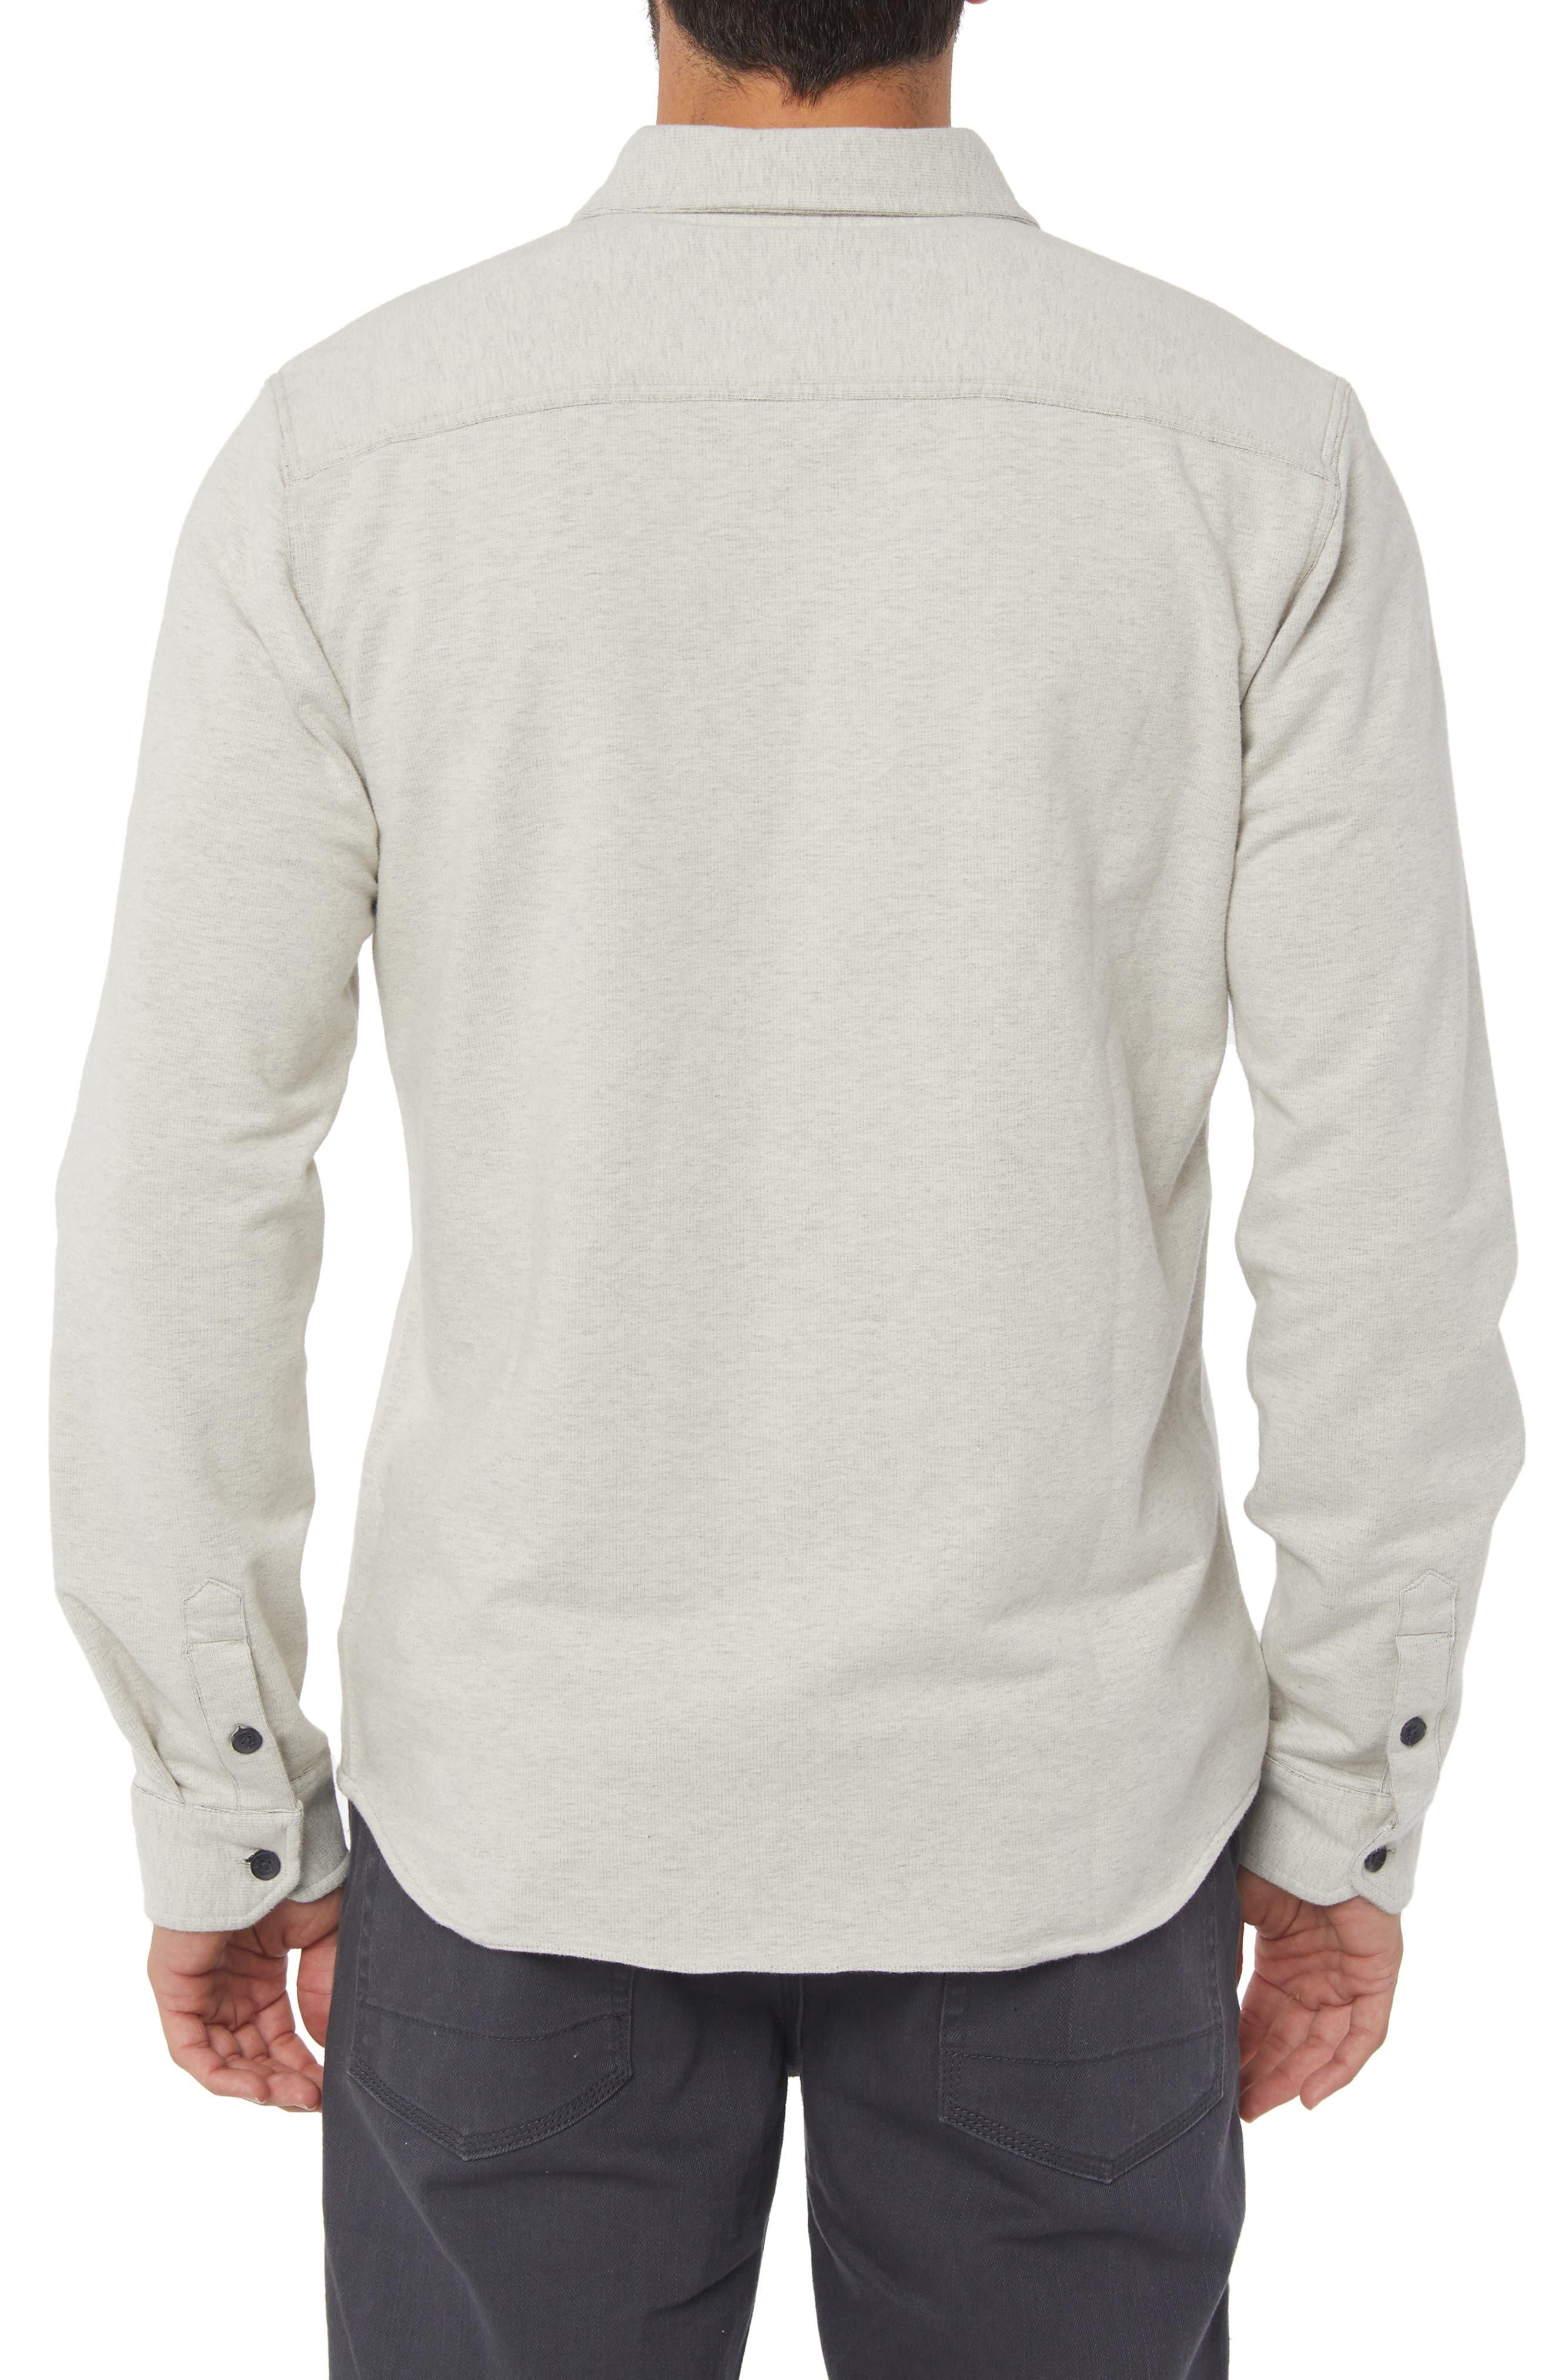 Anton Long Sleeve Shirt,                             Alternate thumbnail 2, color,                             020